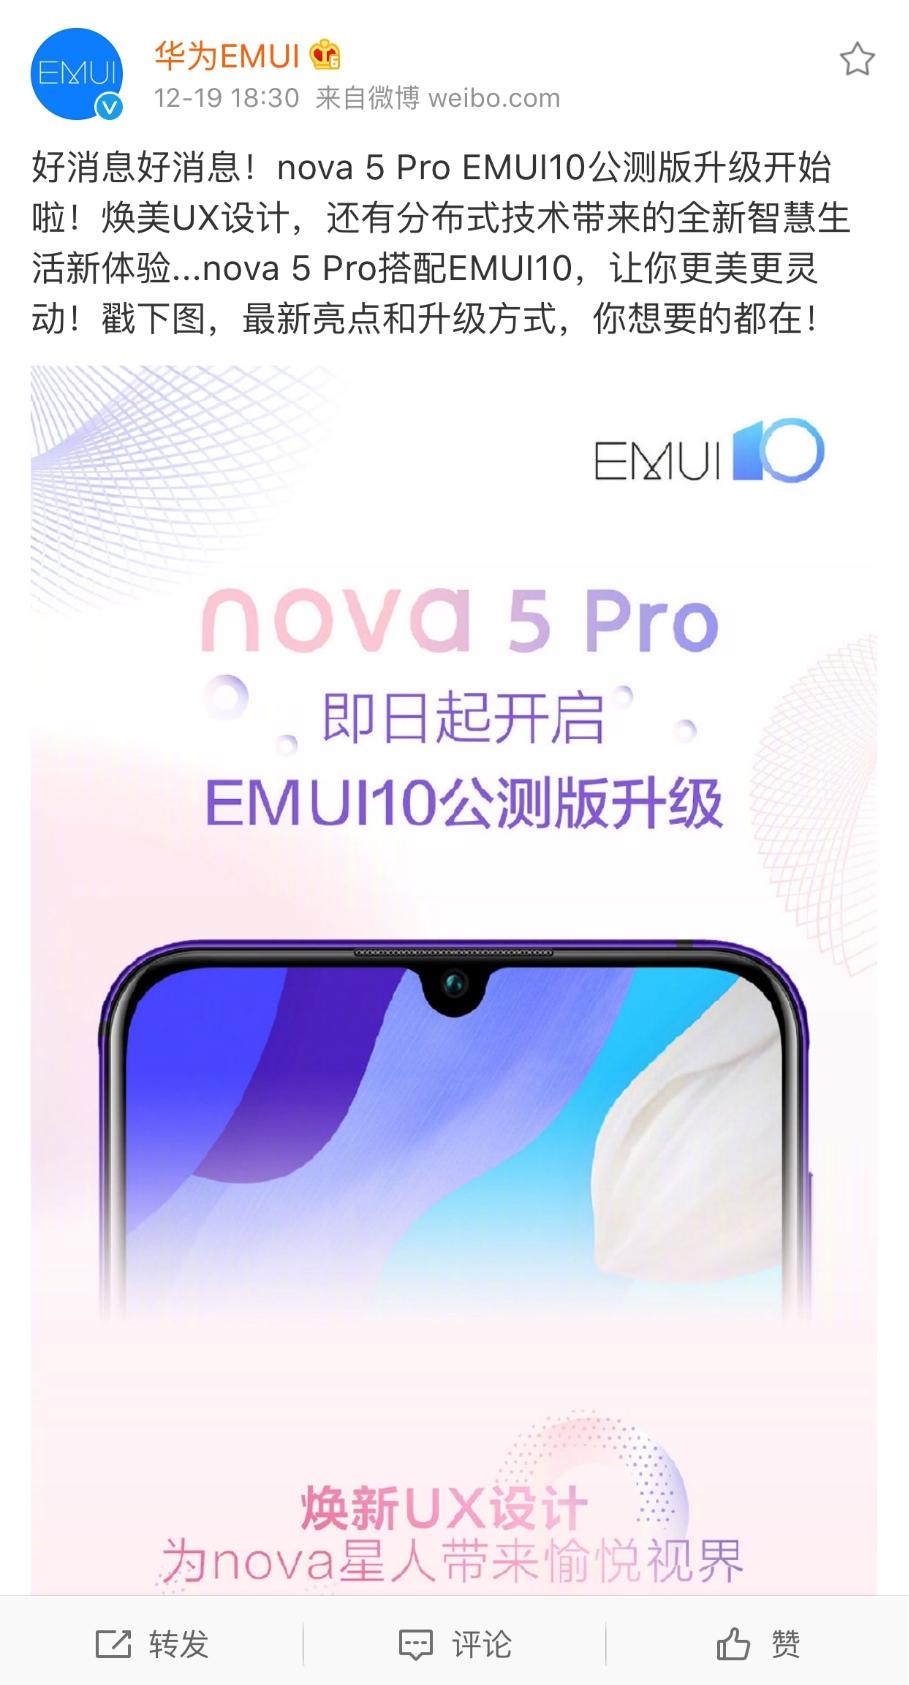 emui10 12月16日,华为nova 5 Pro迎来EMUI10公测升级